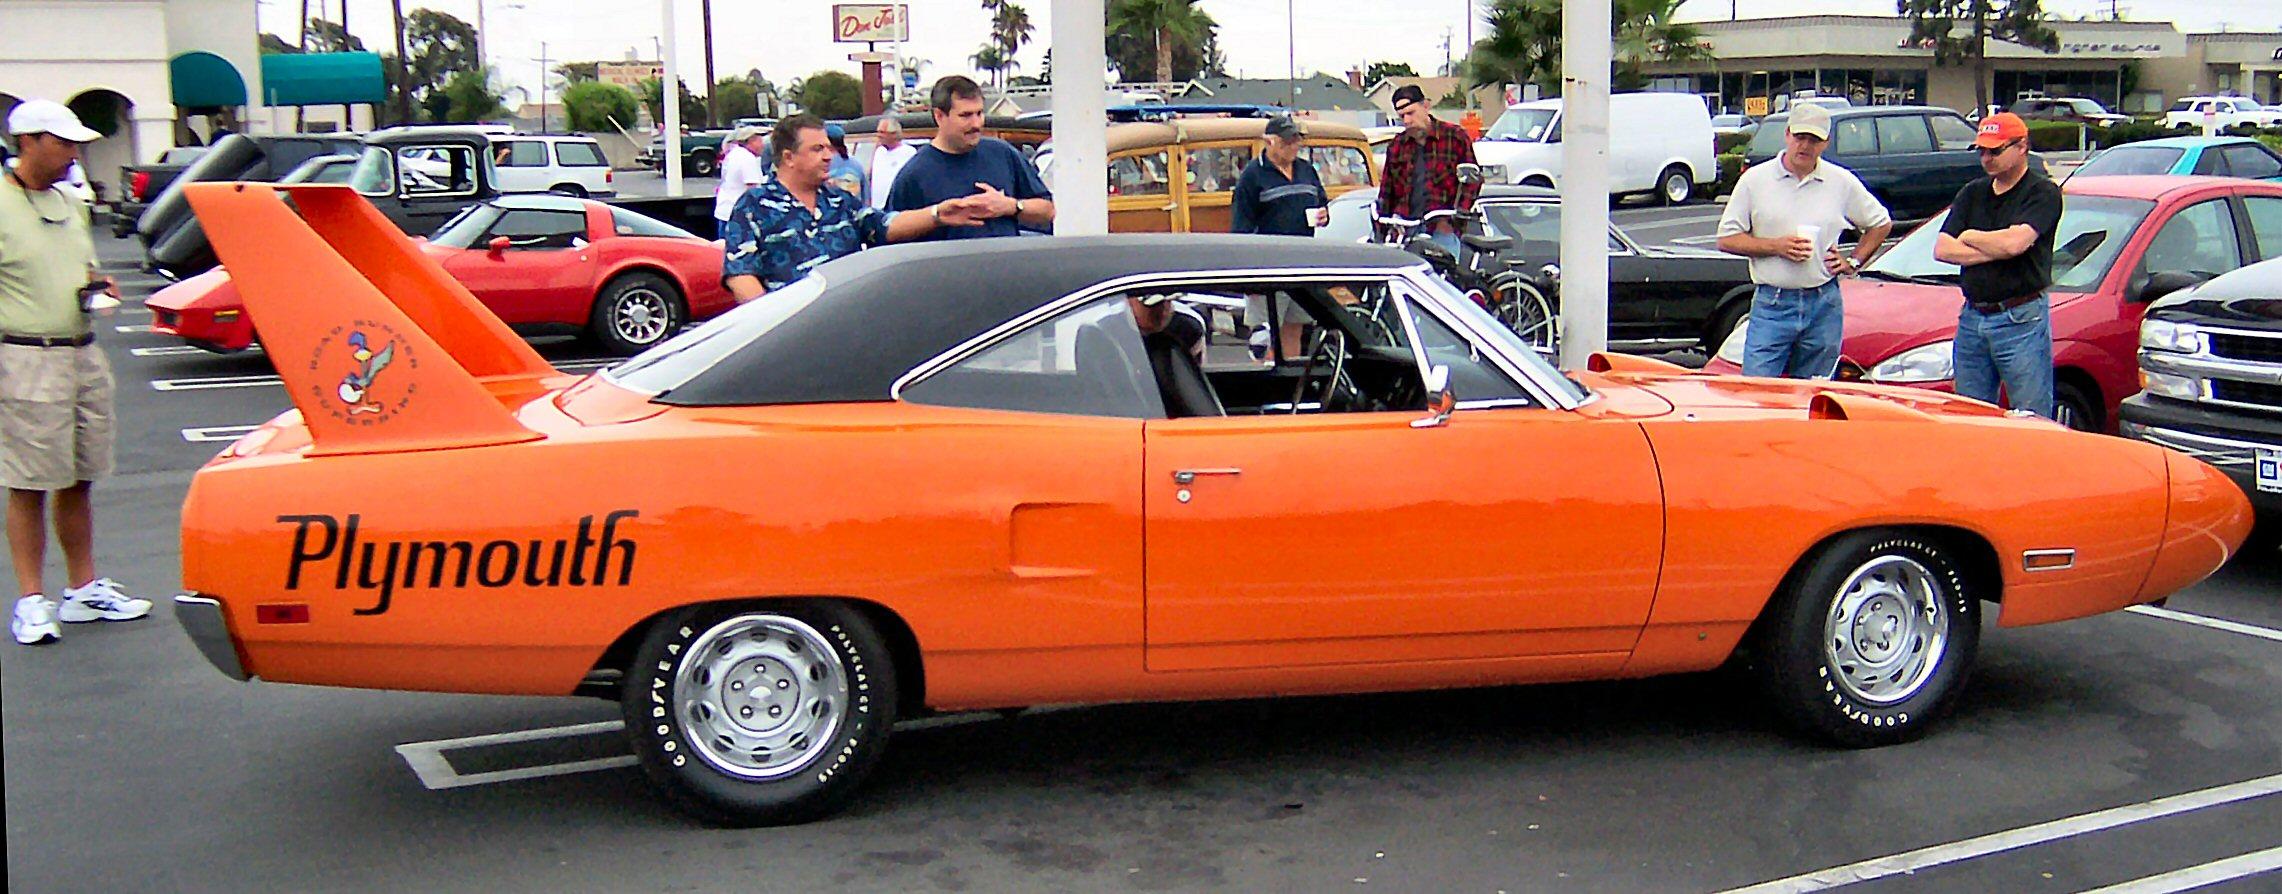 Plymouth Road Runner Superbird Photos Reviews News Specs Buy Car